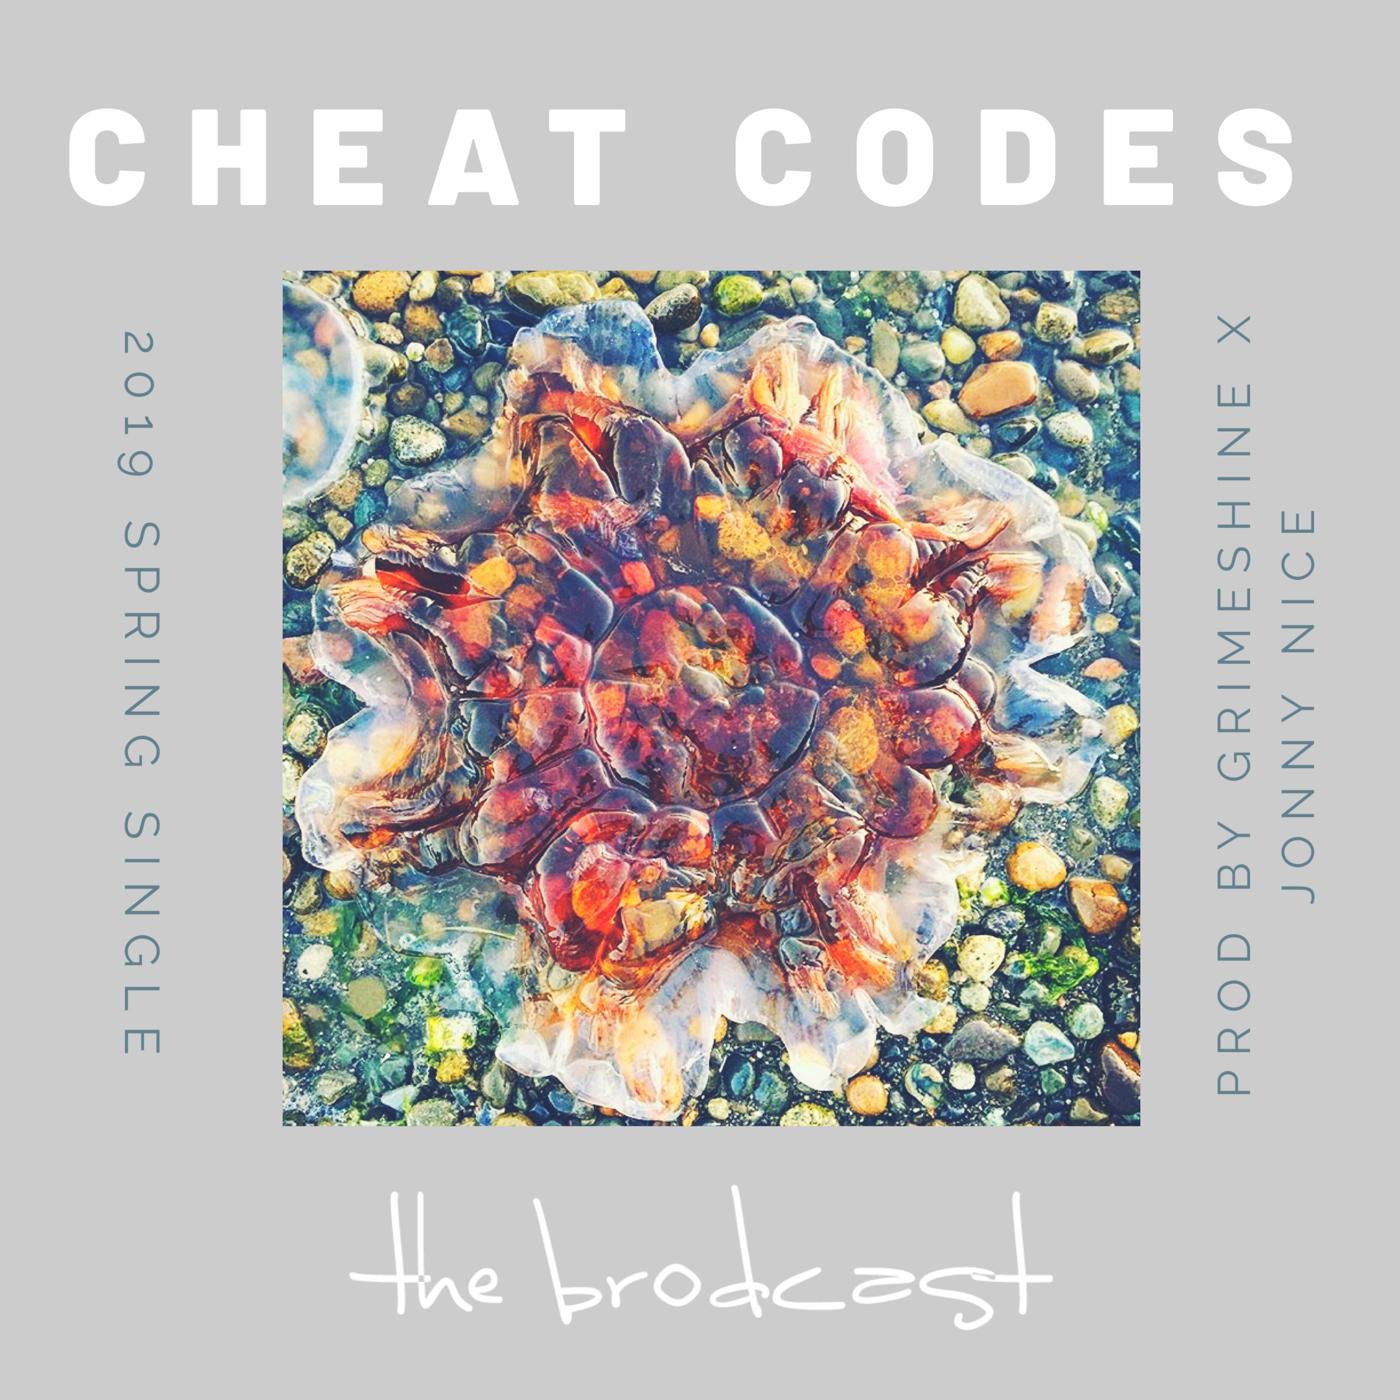 Cheat codes art.JPEG